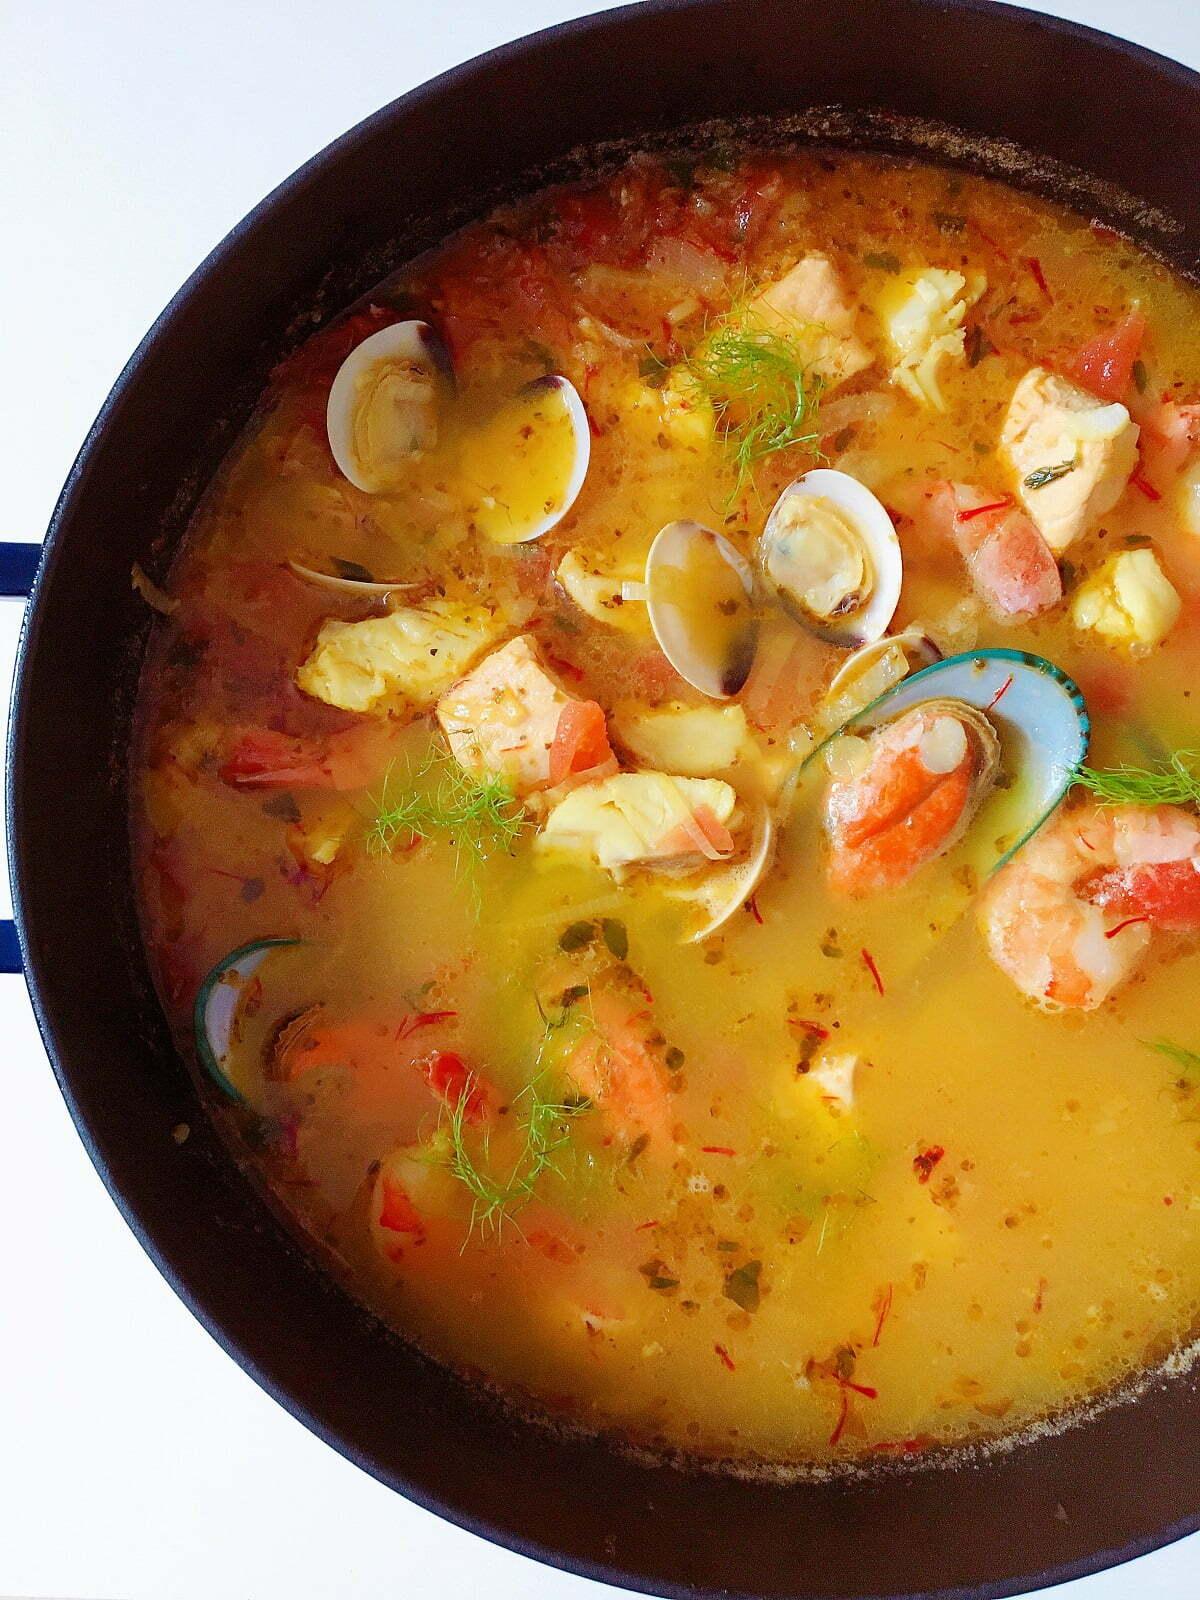 Sumptuous Bouillabaisse Marseilles: A Classic and Easy Fish Soup